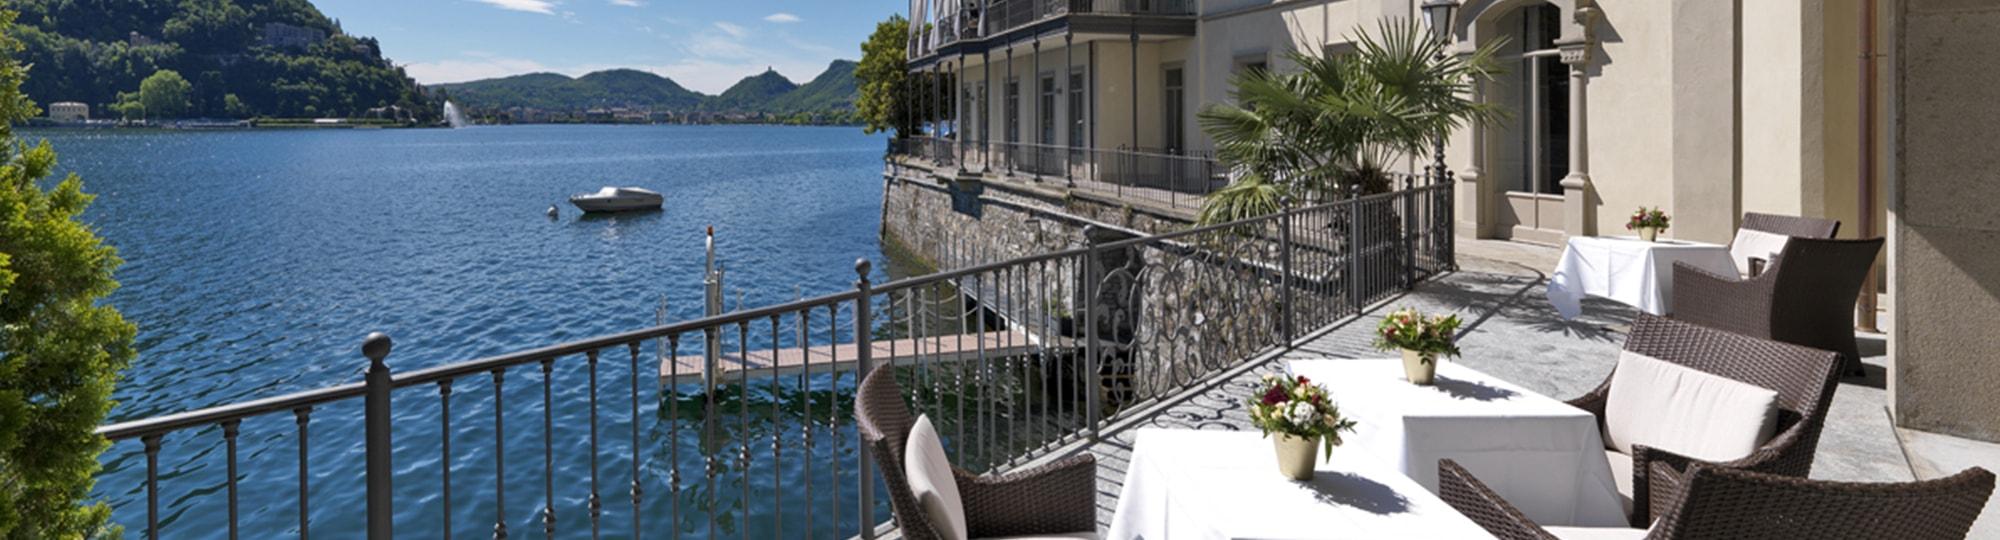 Villa flori 4 r server l 39 h tel villa flori - Hotel de charme lac de come ...